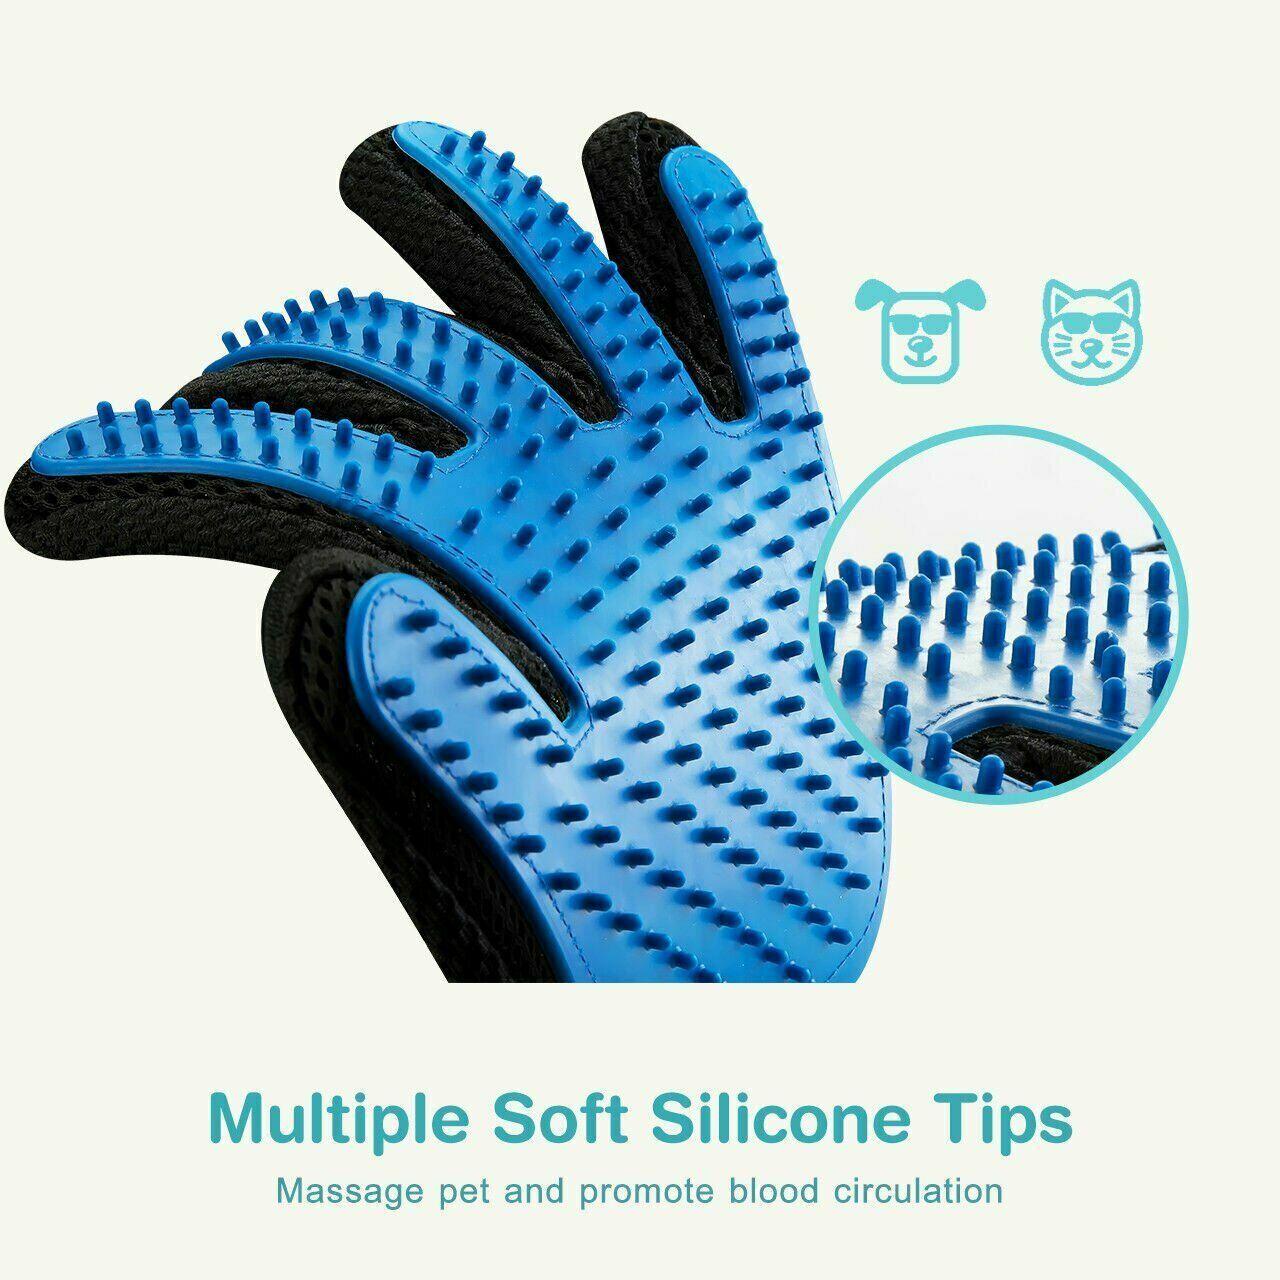 2x Pet Grooming Glove Brush Dog Cat Fur Hair Removal Mitt Massage Deshedding Brushes, Combs & Rakes